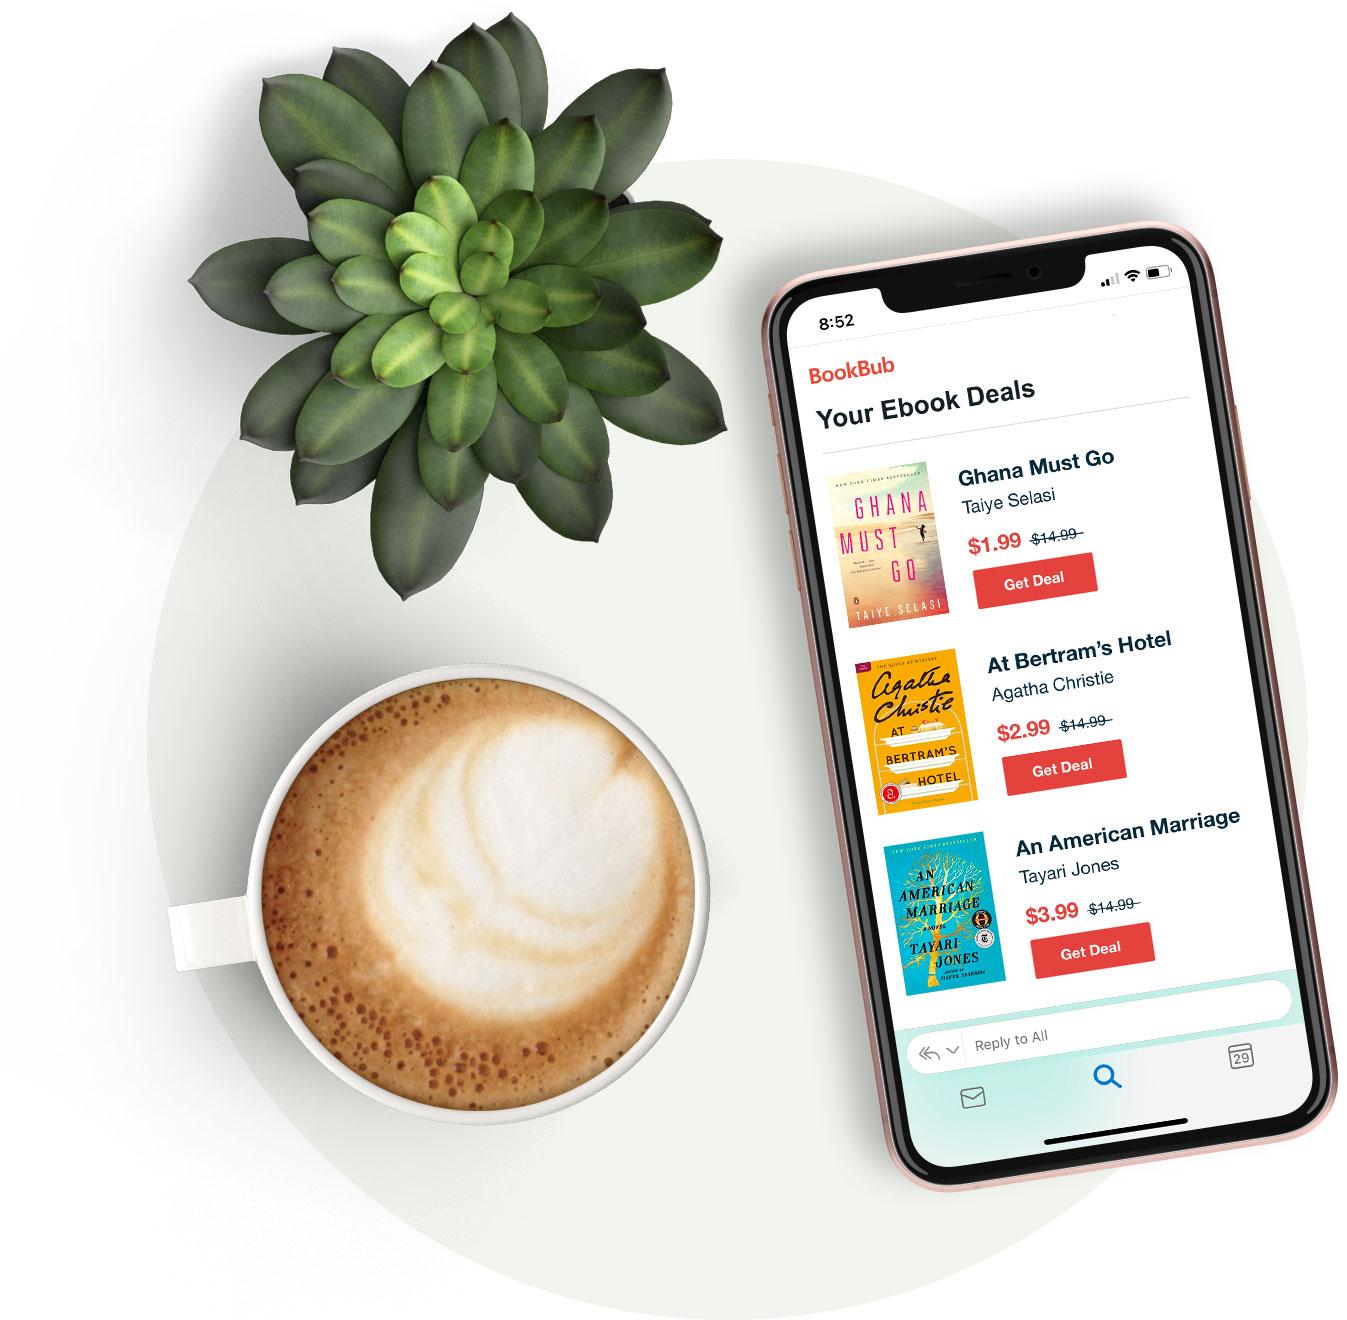 Coffee & a phone, displaying a BookBub email